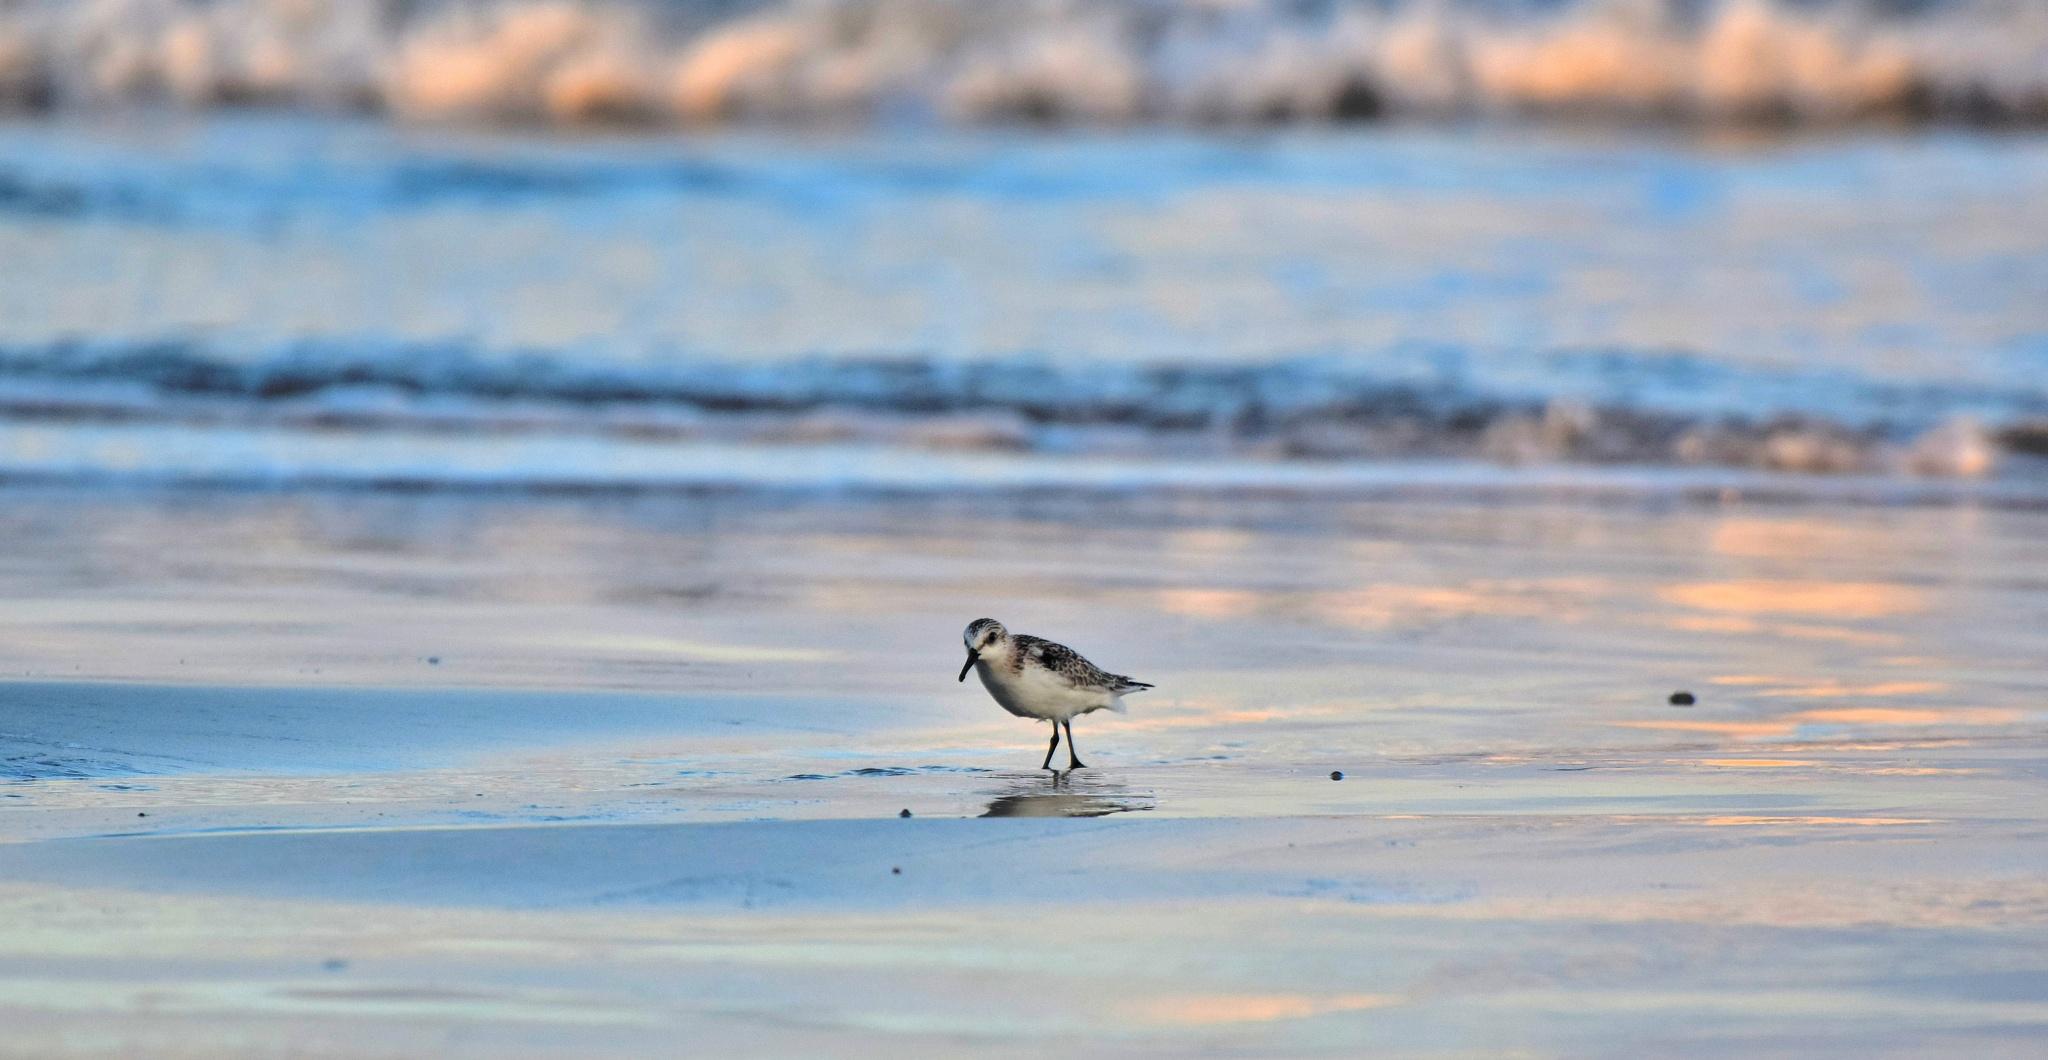 Galveston Birds 81 by Lawrence Scott Hess